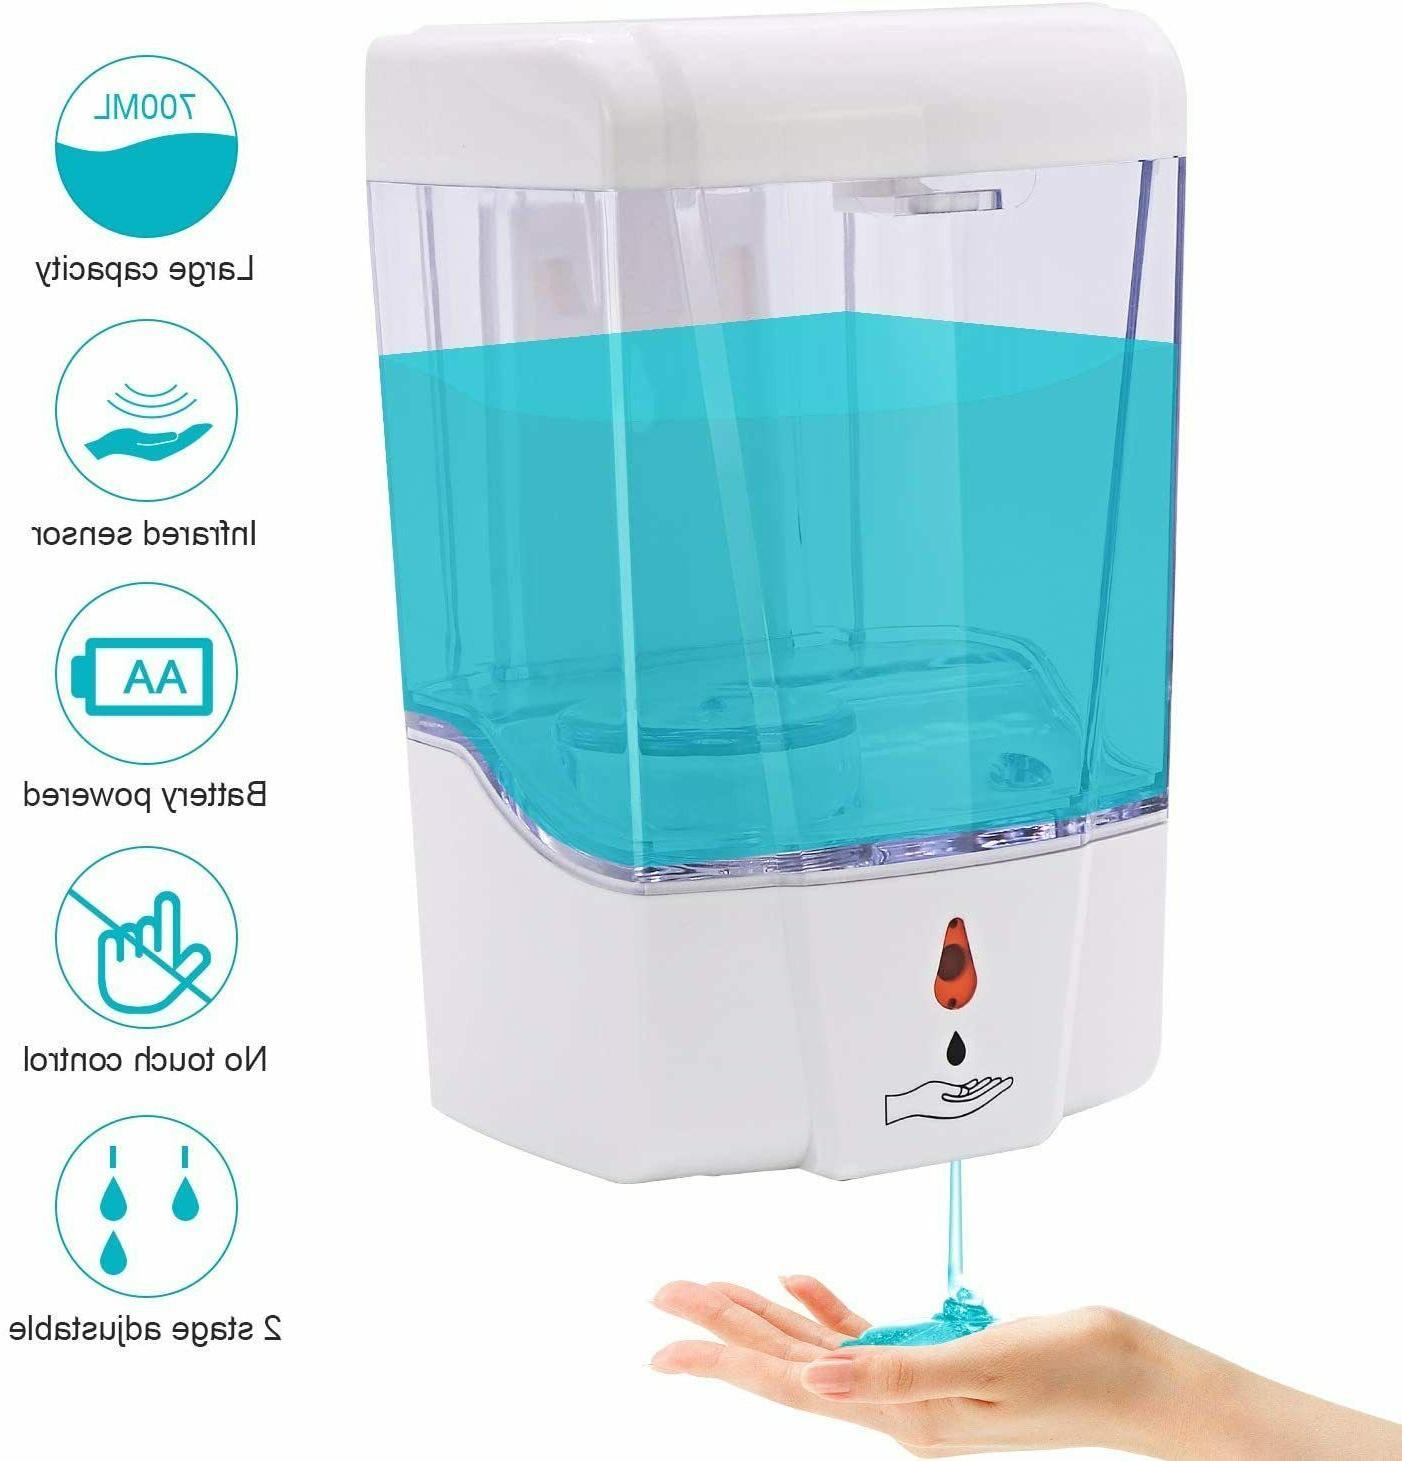 automatic liquid soap dispenser 700ml handfree touchless